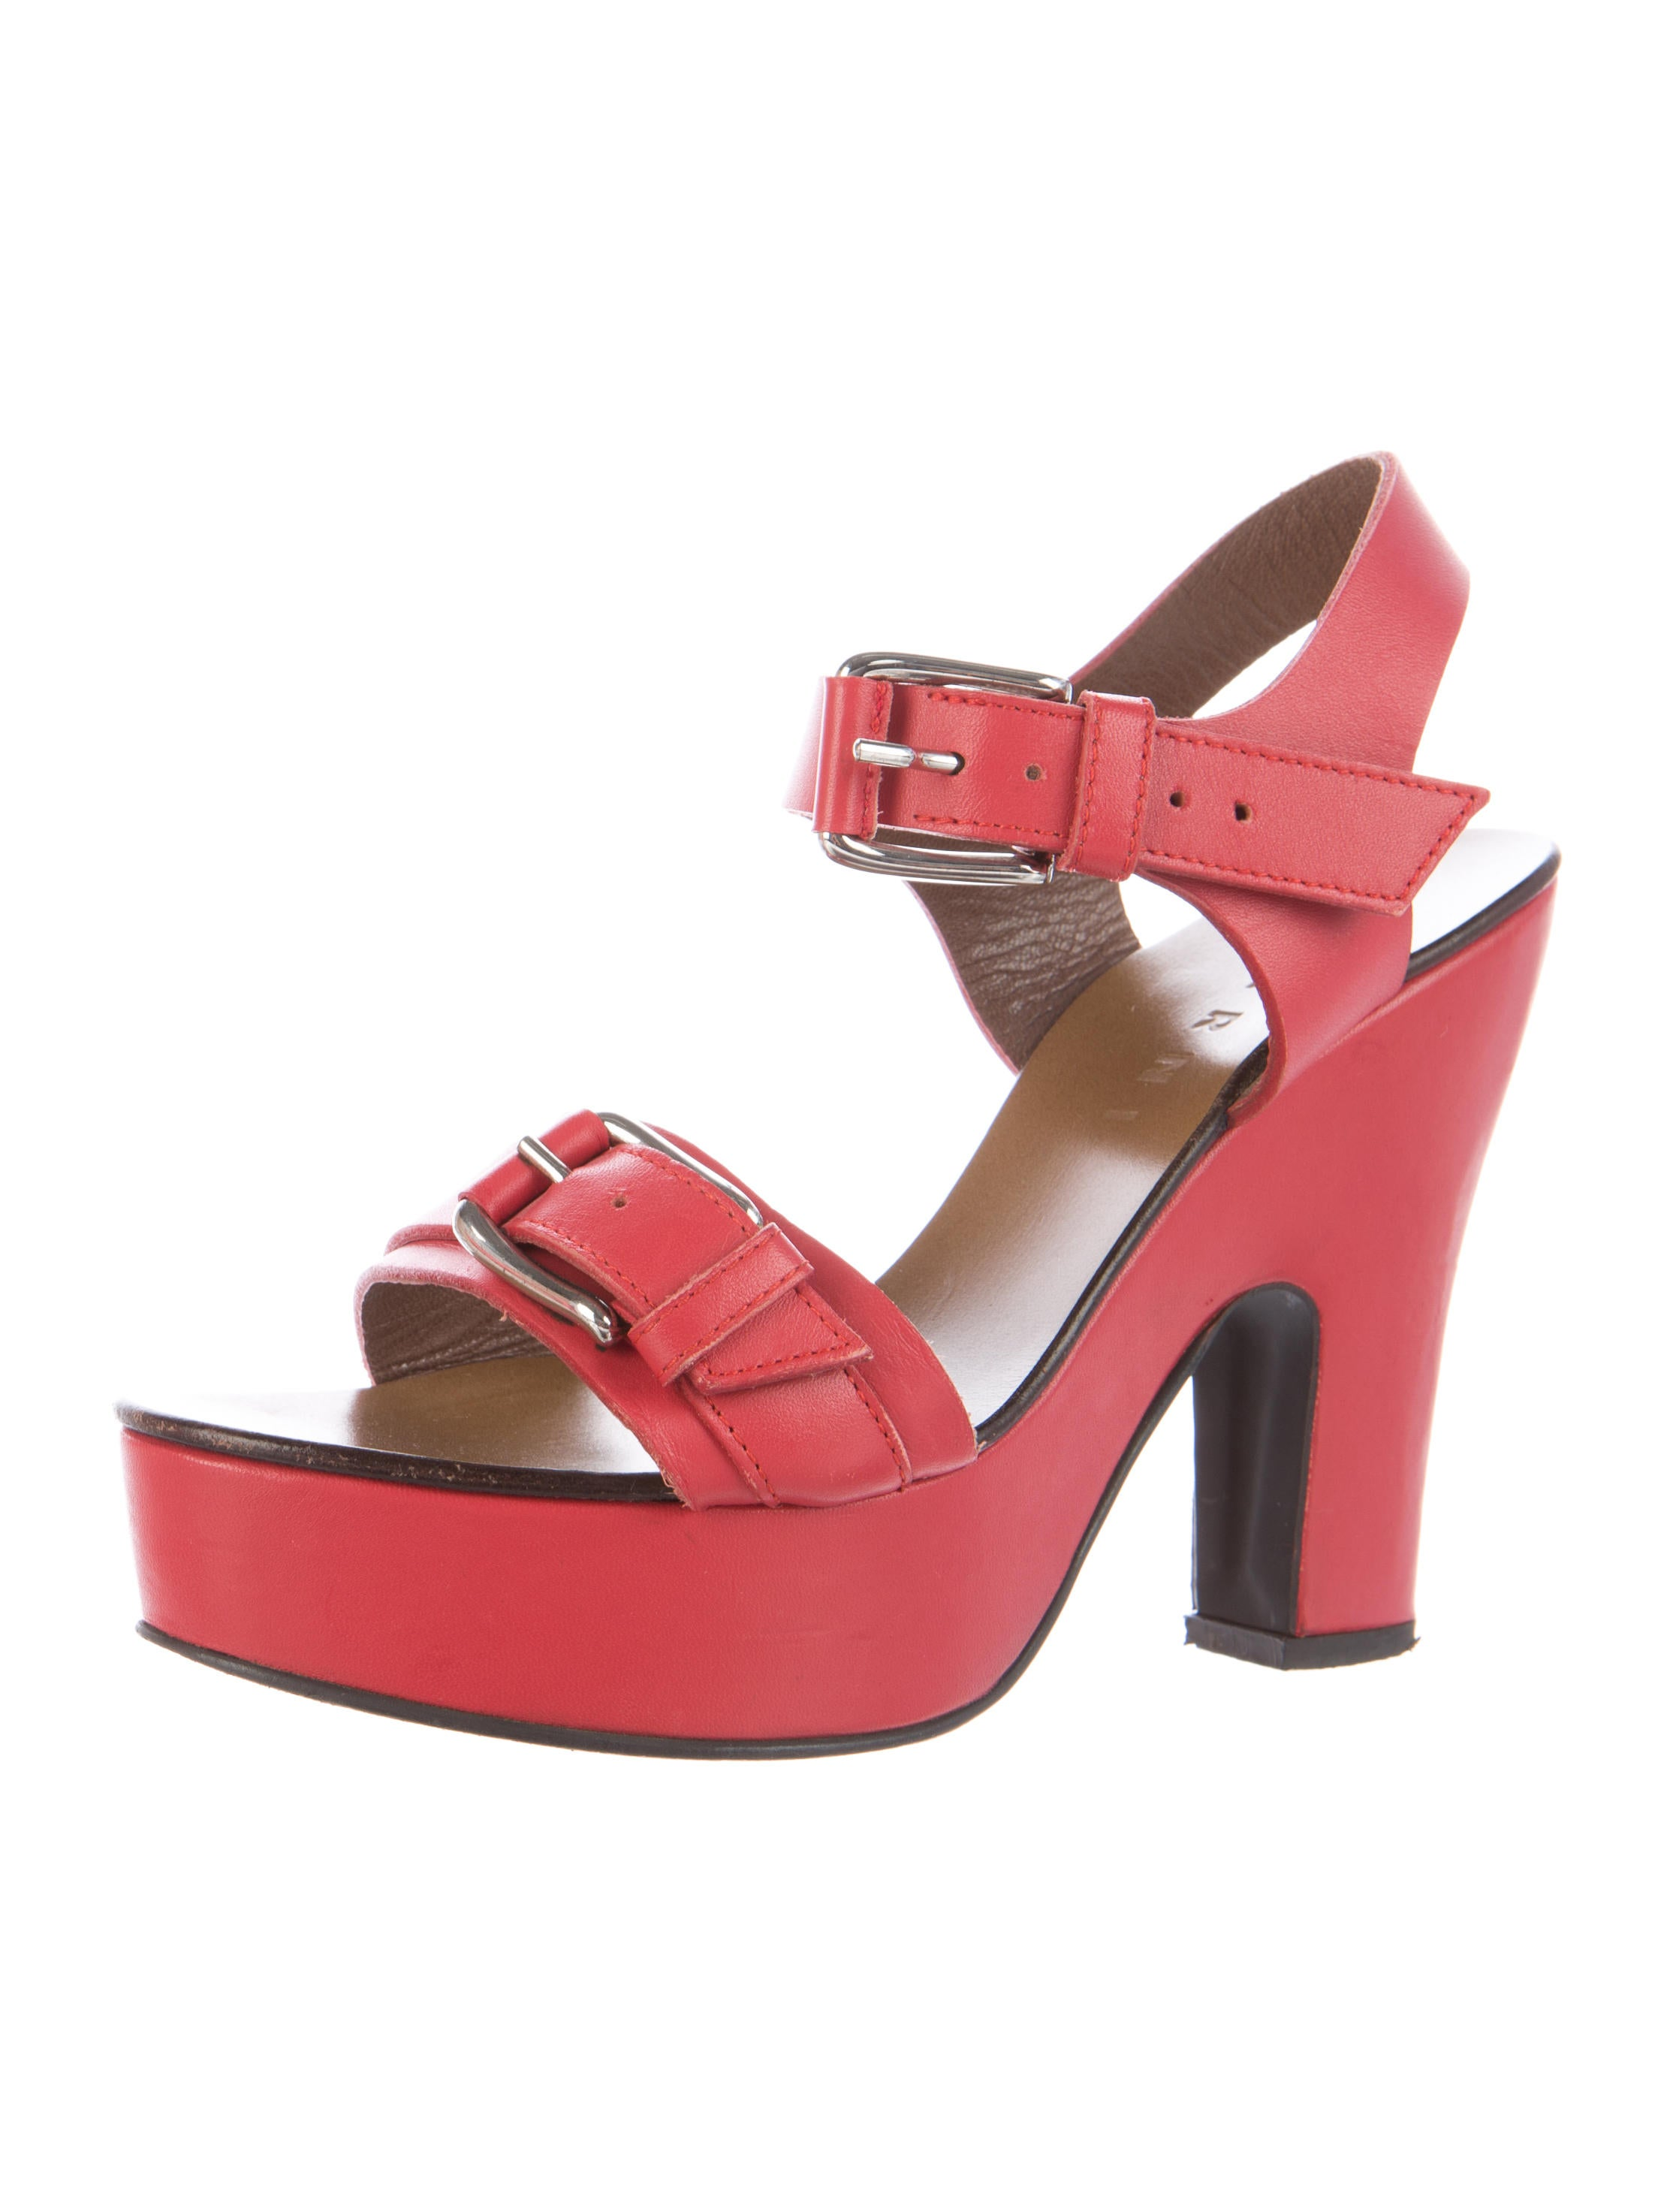 marni leather platform sandals shoes man44257 the